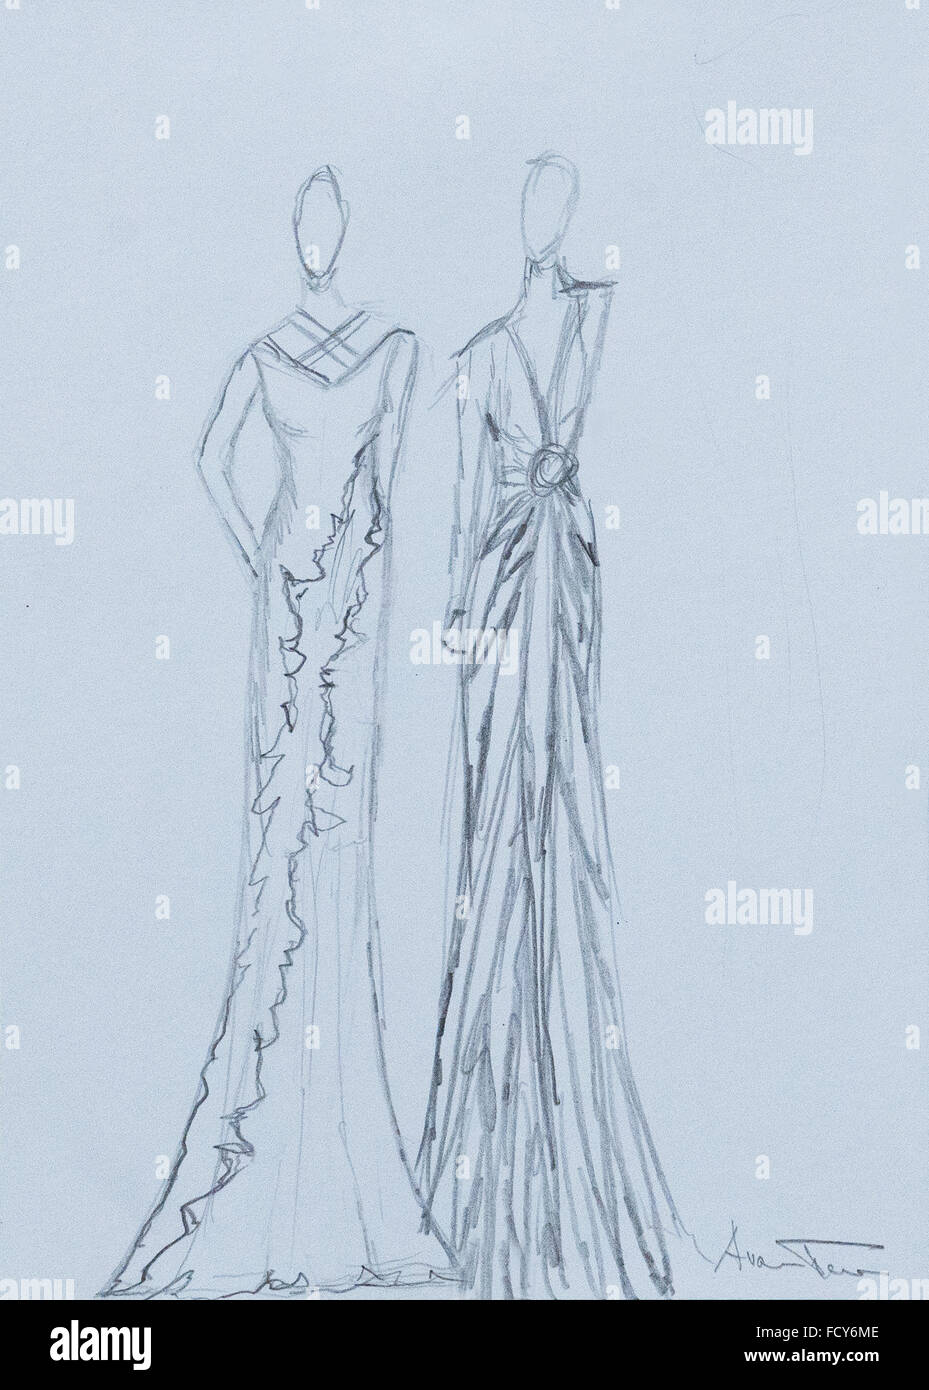 Handmade Fashion Sketch Of A Woman Long Dress In A Black White Stock Photo Alamy